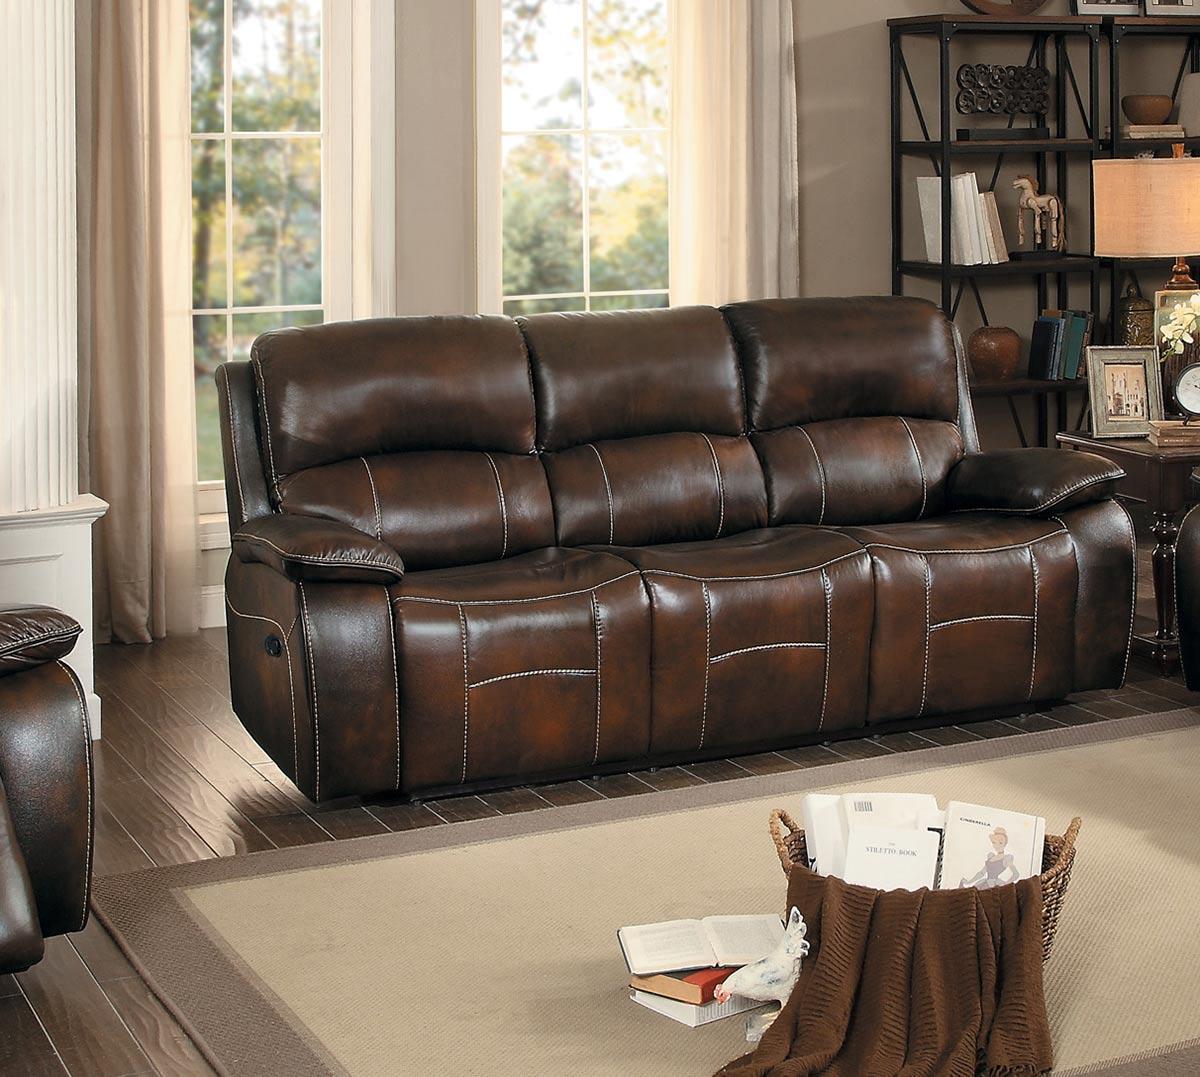 Homelegance Mahala Double Reclining Sofa - Brown Top Grain Leather Match